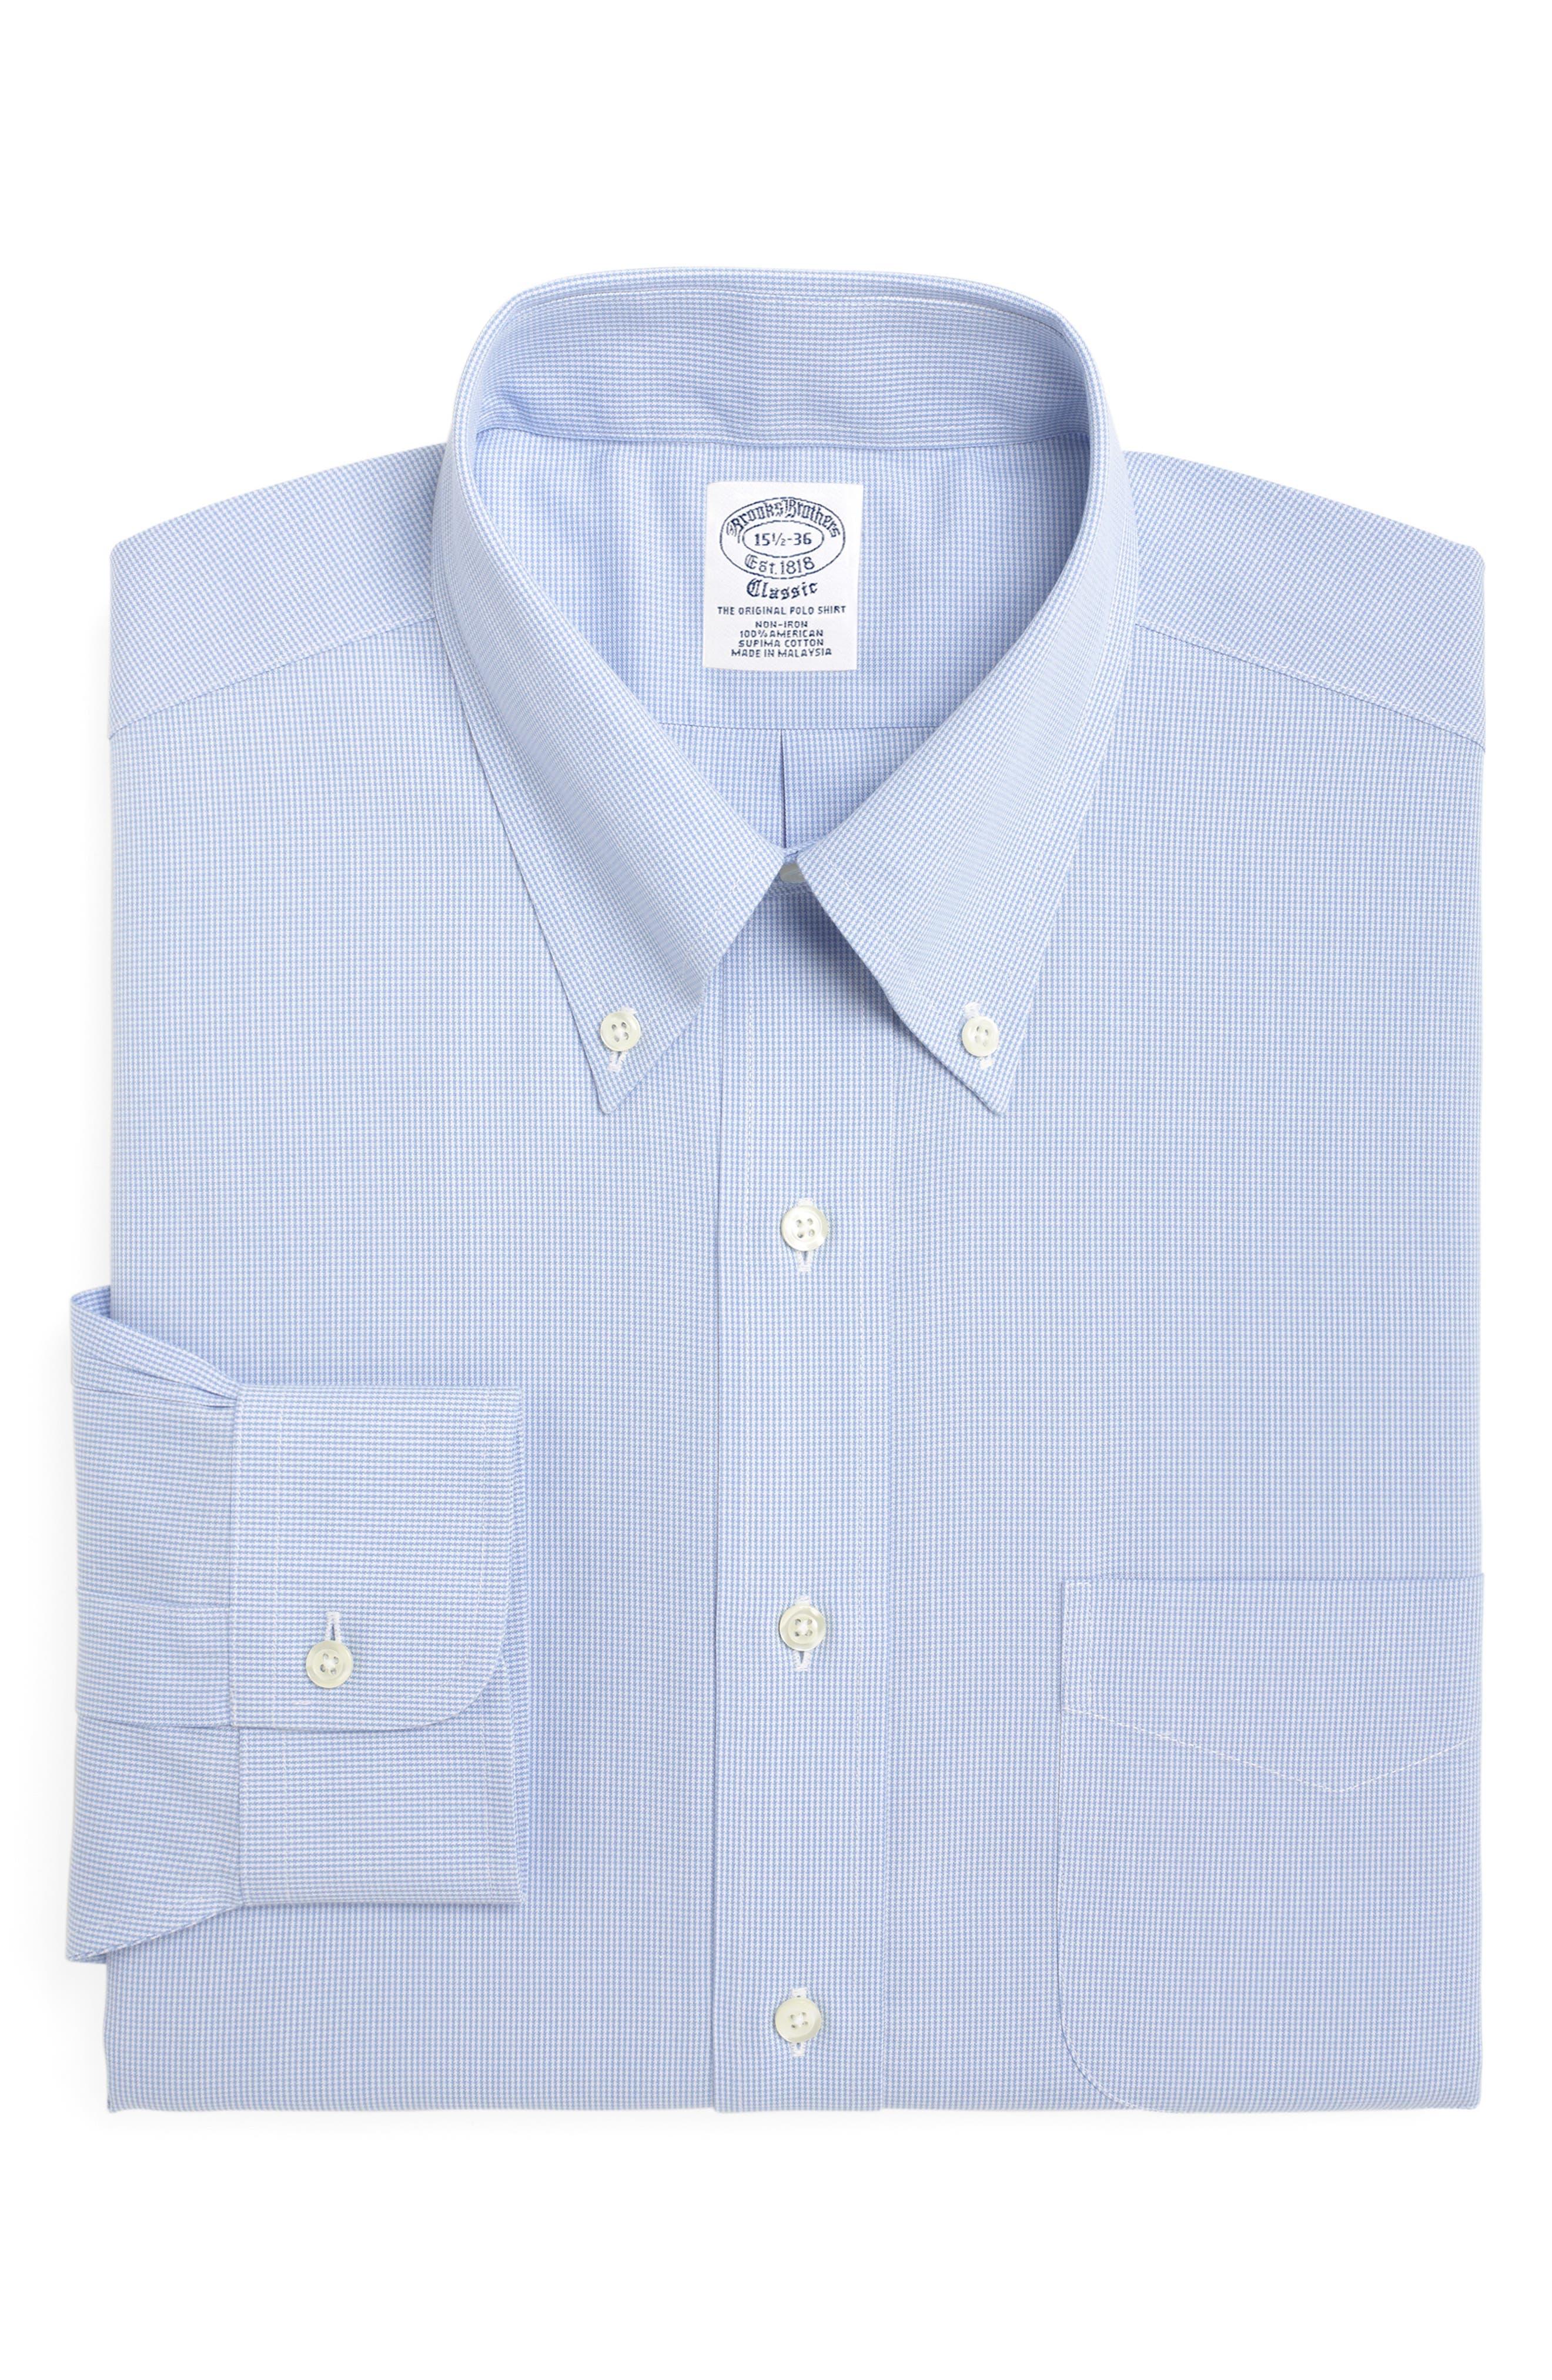 Regular Fit Houndstooth Dress Shirt,                             Main thumbnail 1, color,                             LIGHT/ PASTEL BLUE